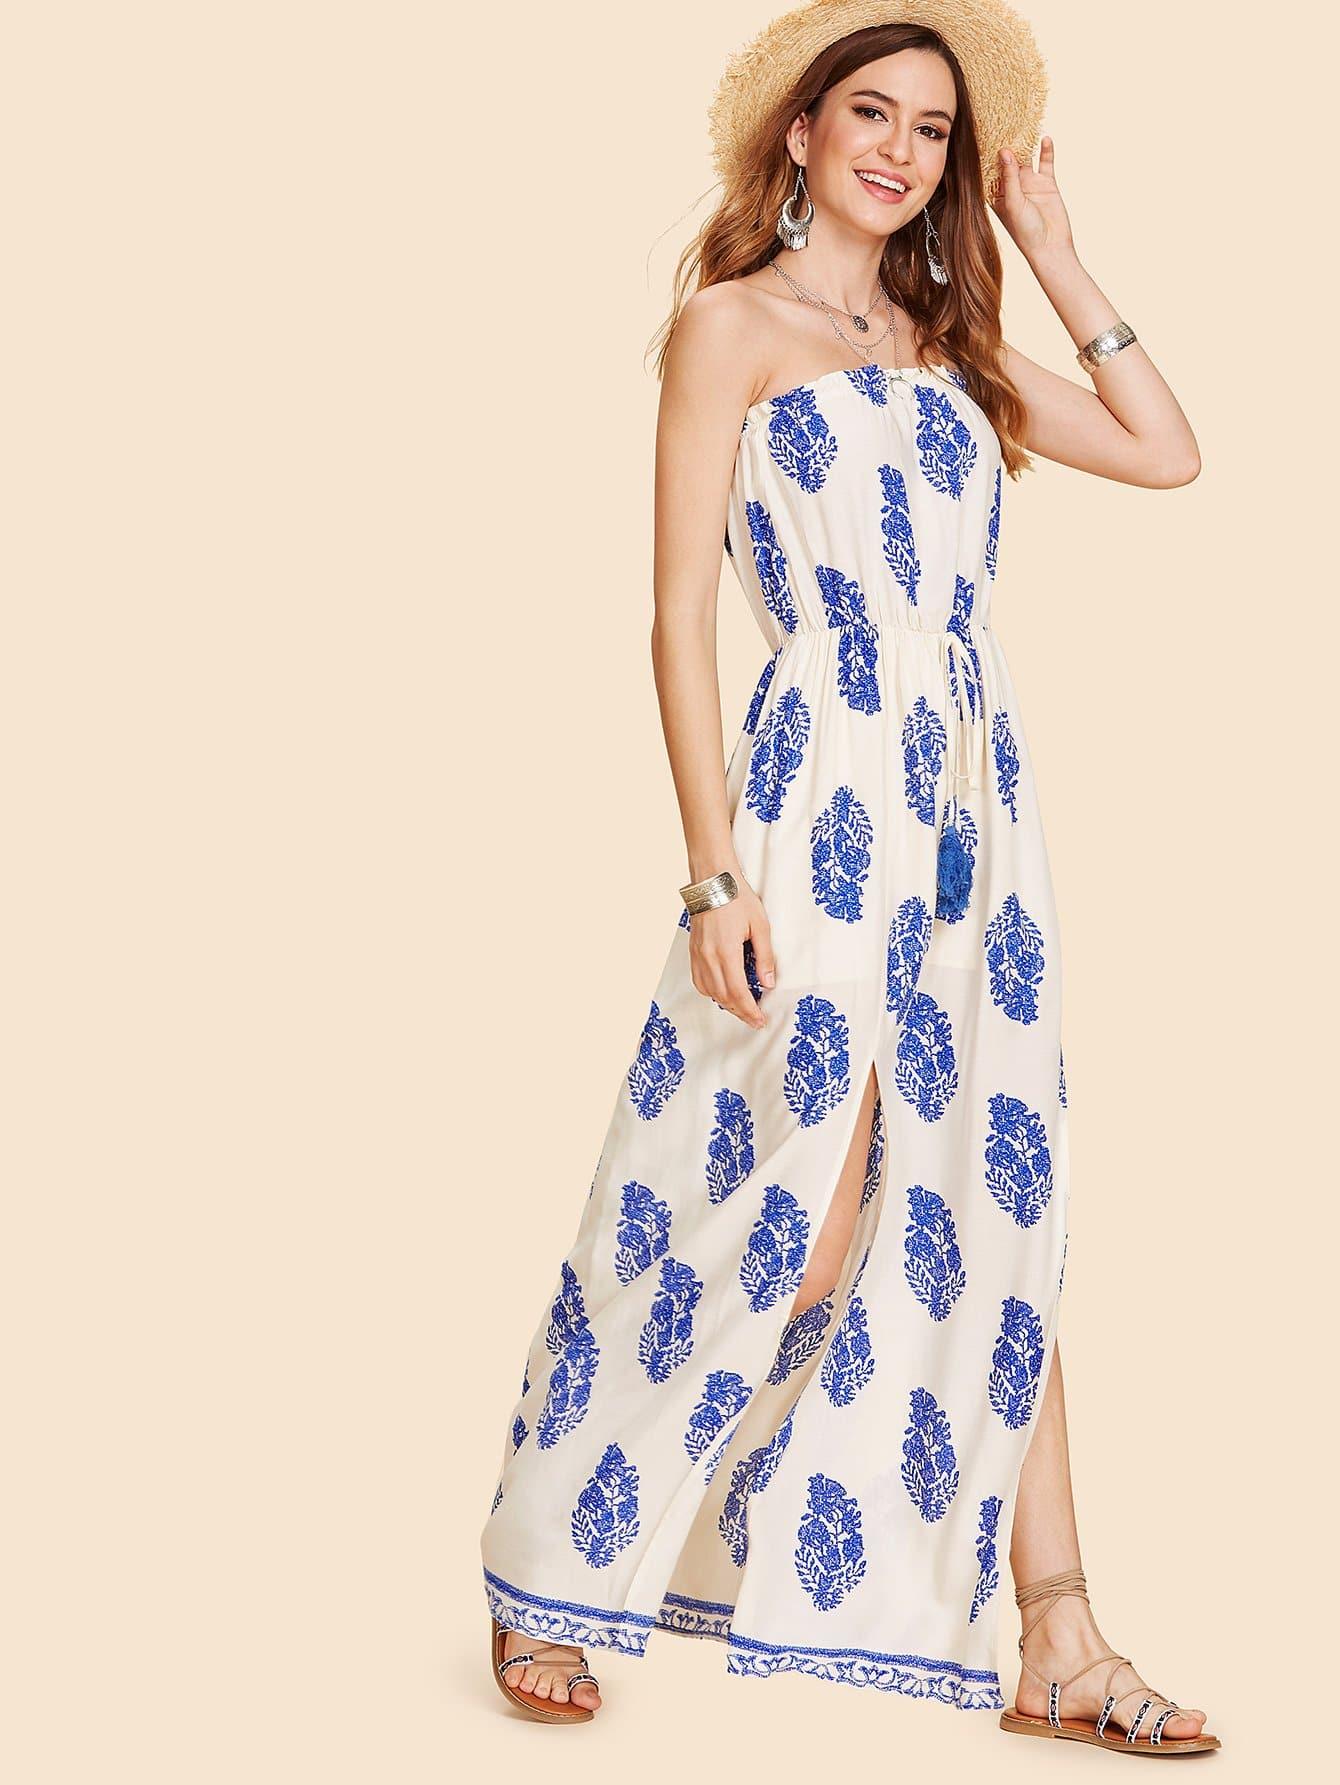 Drawstring Waist M-Slit Tube Dress drawstring waist m slit tube dress